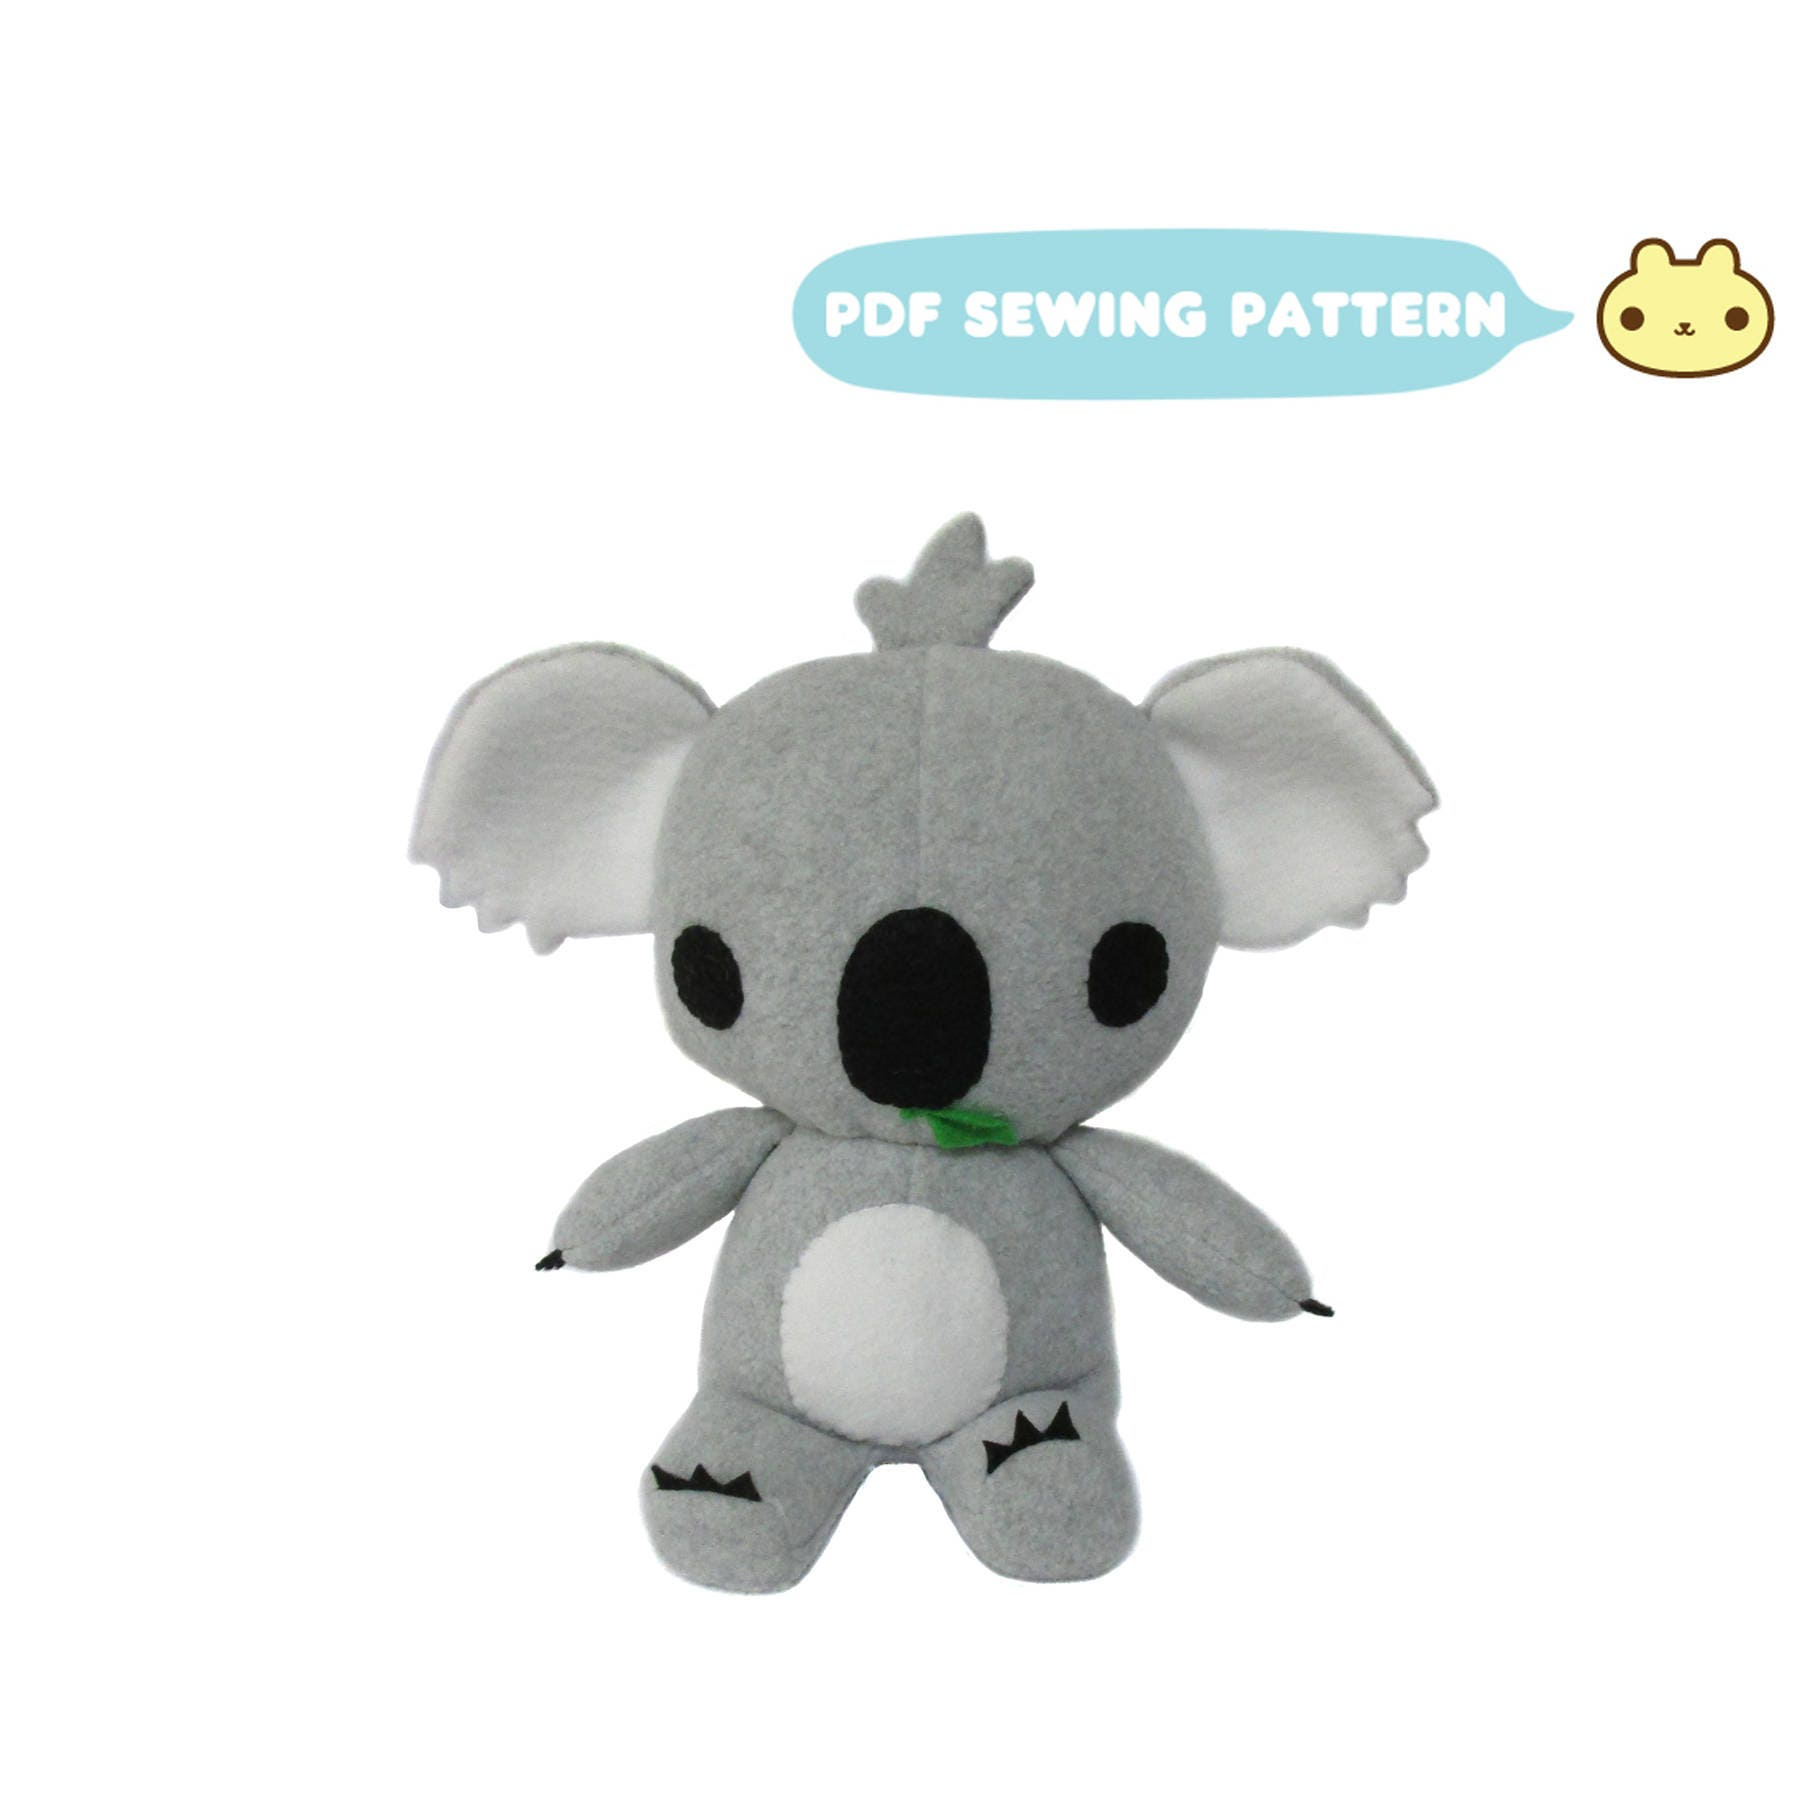 Koala Sewing Patterns Koala Bear Toy Koala Stuffed Animal Etsy